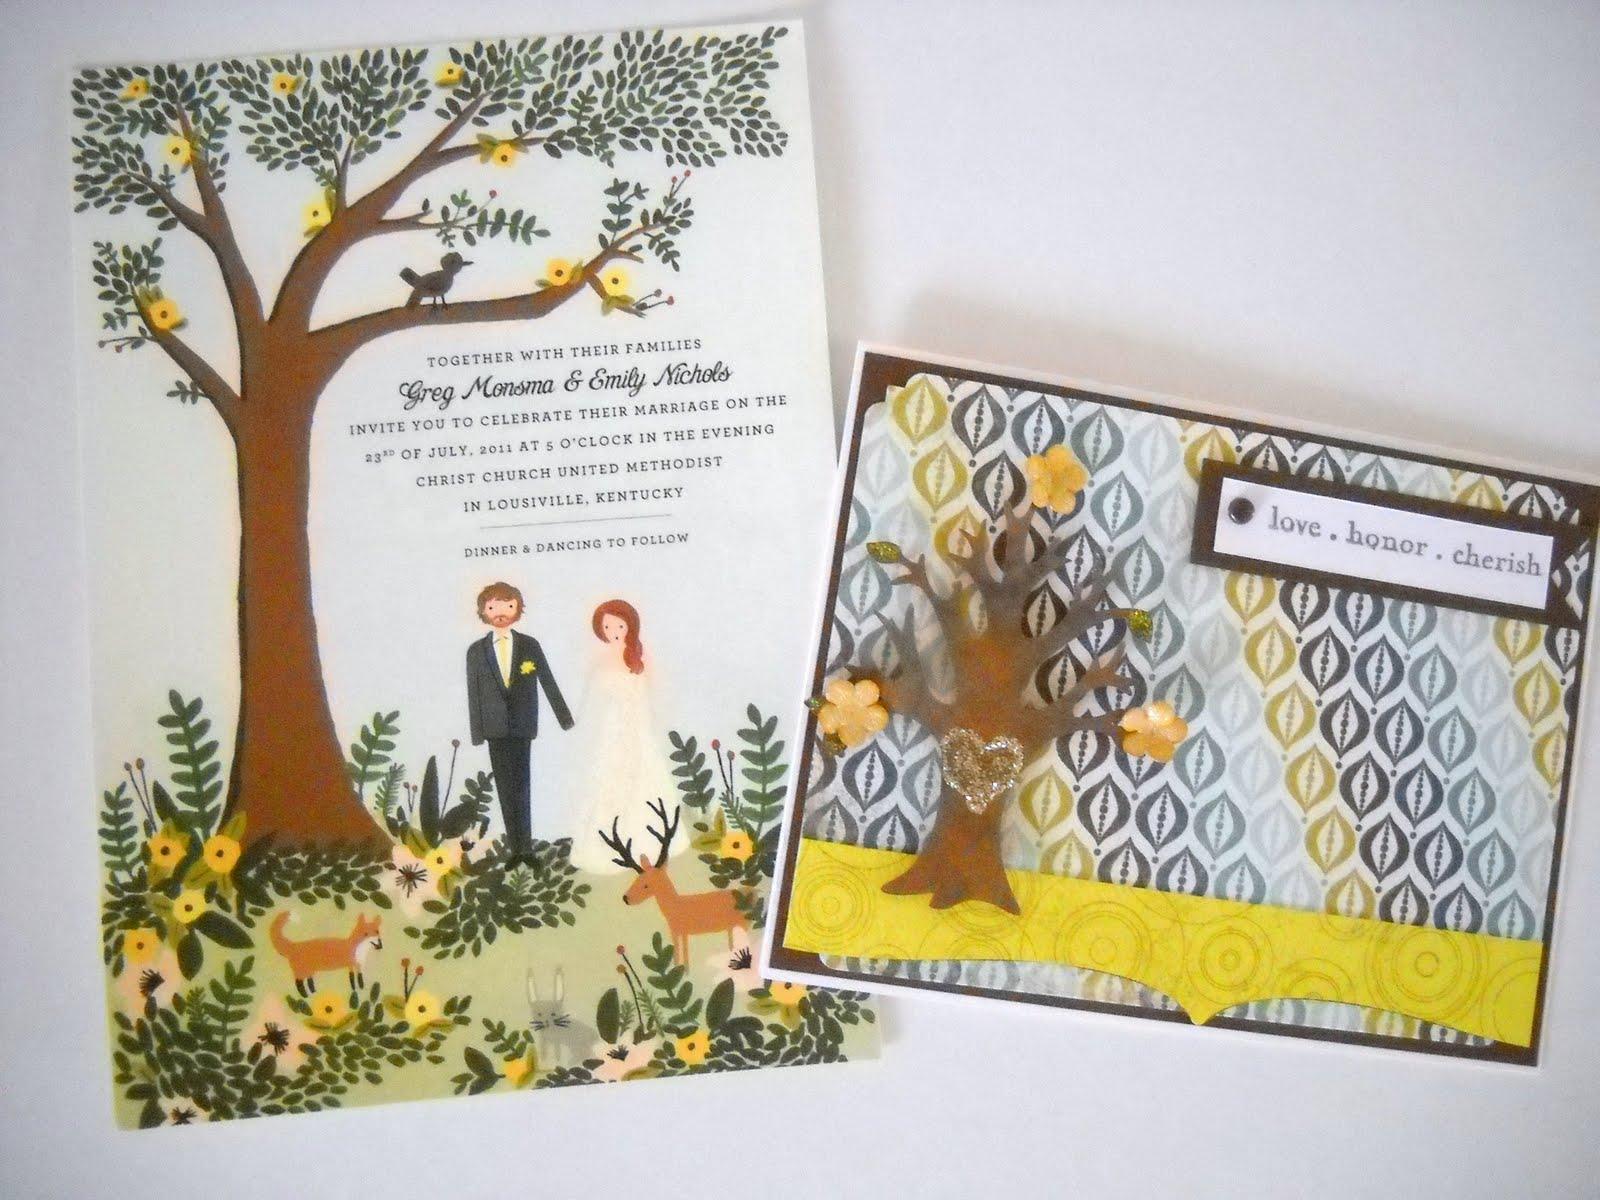 A Wedding Card with Invitation